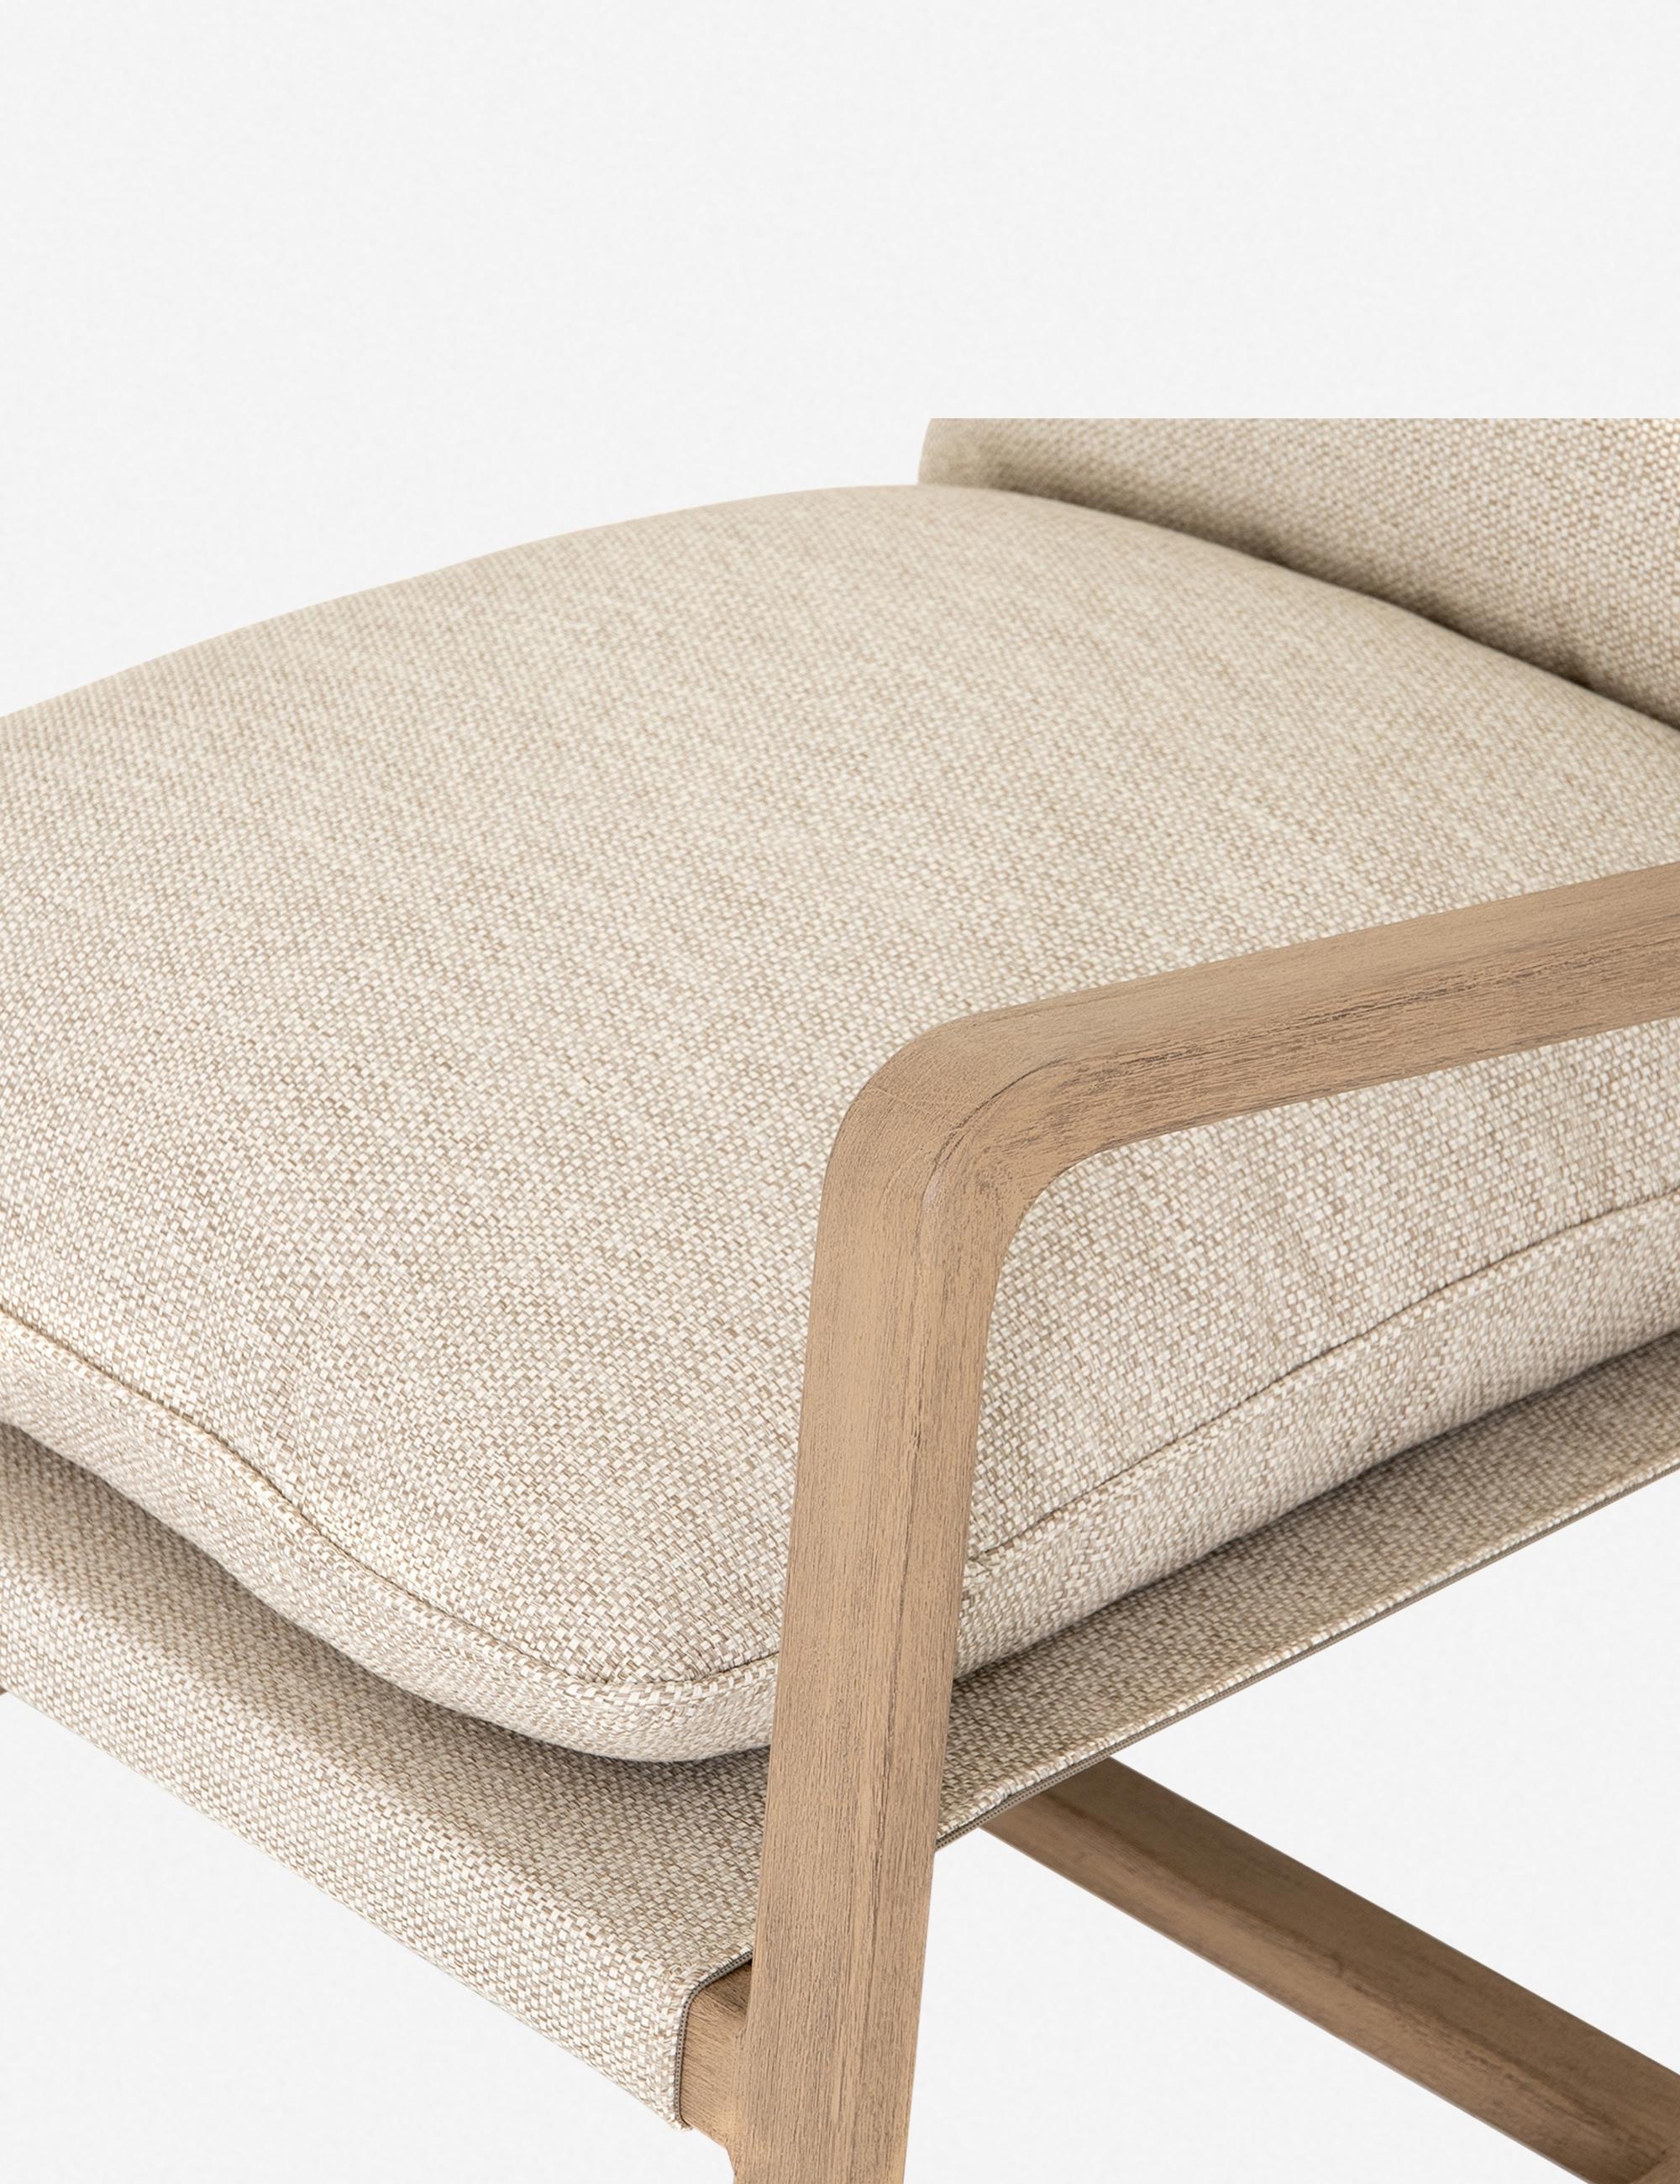 Nunelle Indoor/Outdoor Chair, Faye Sand